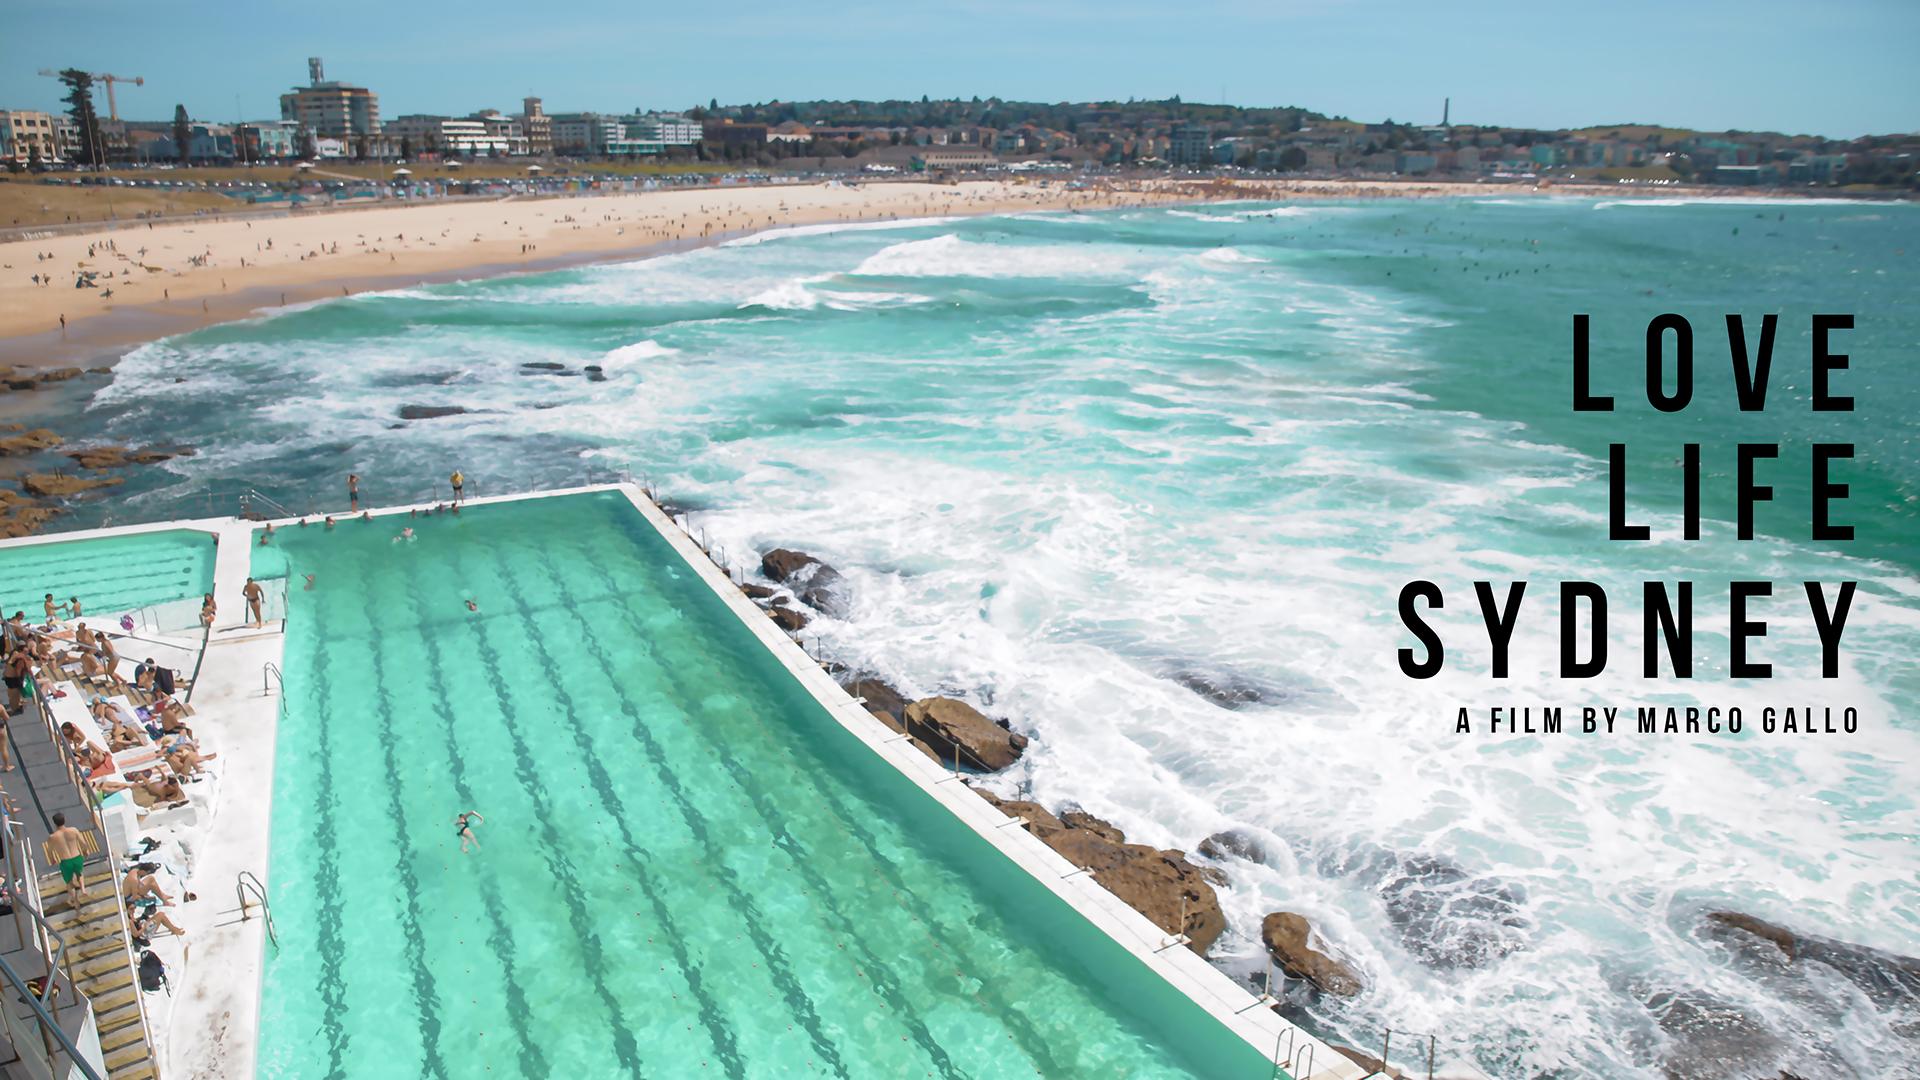 Love. Life. Sydney